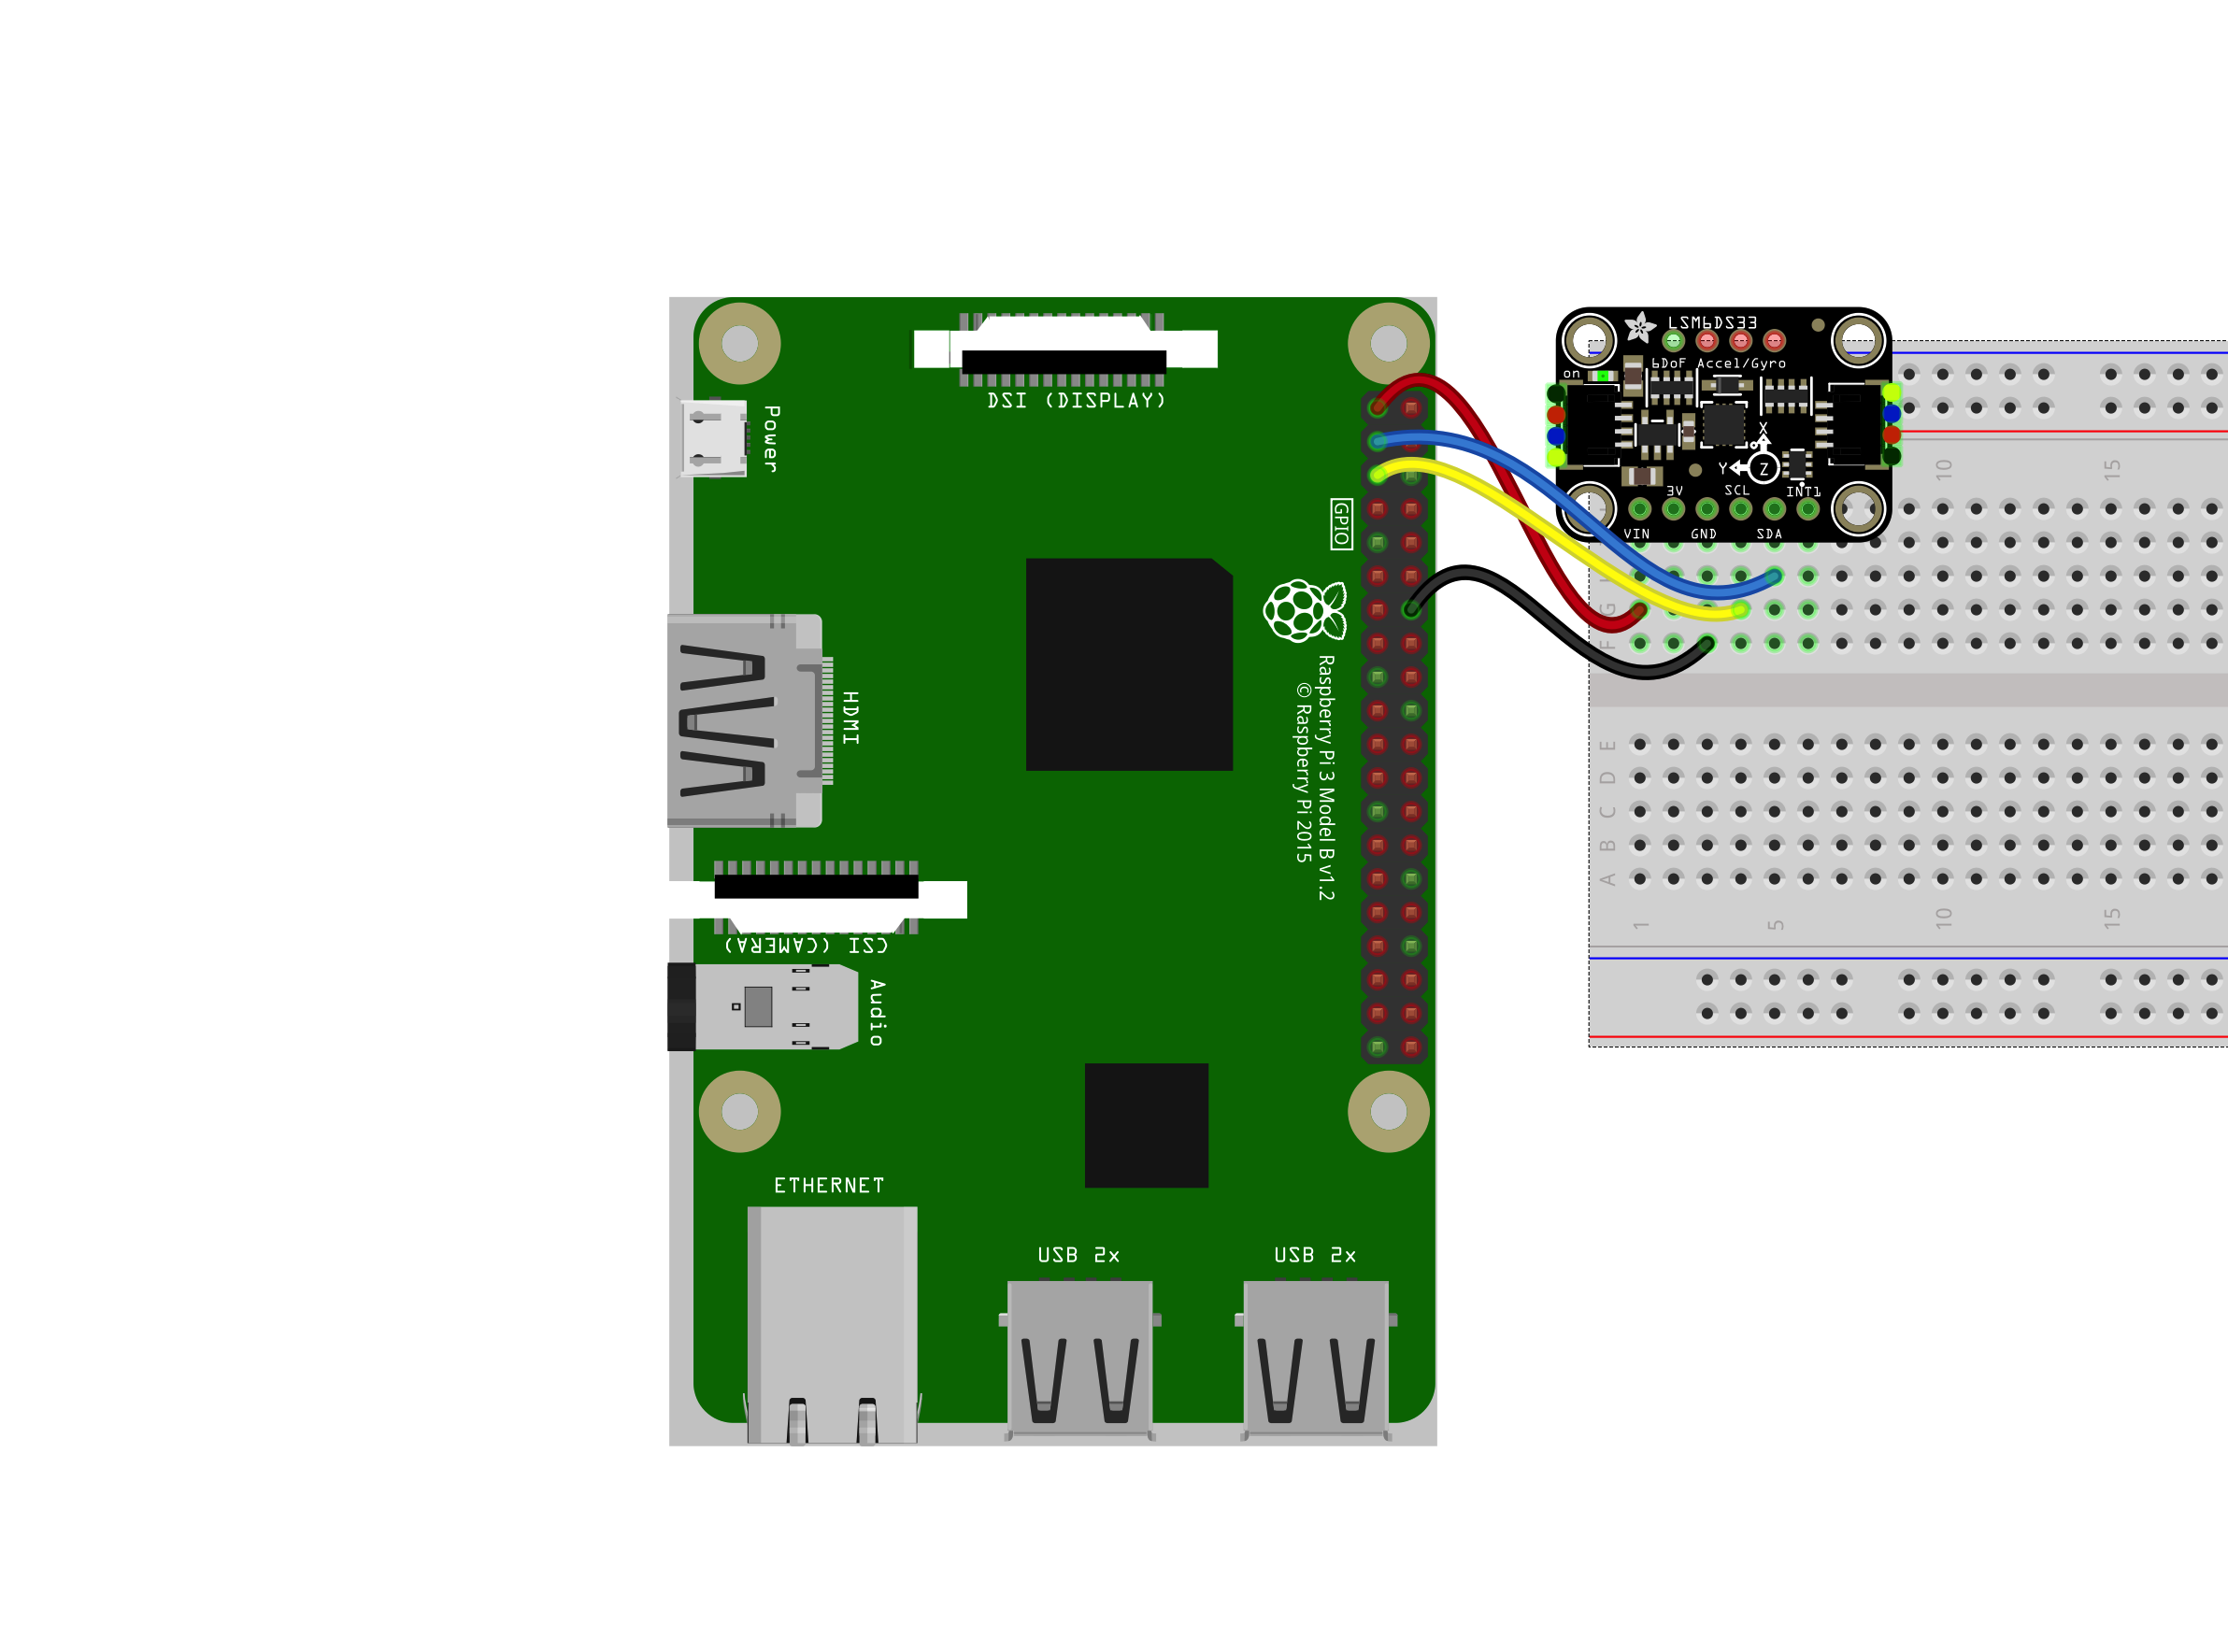 sensors_python_rpi_wiring_breadboard.png